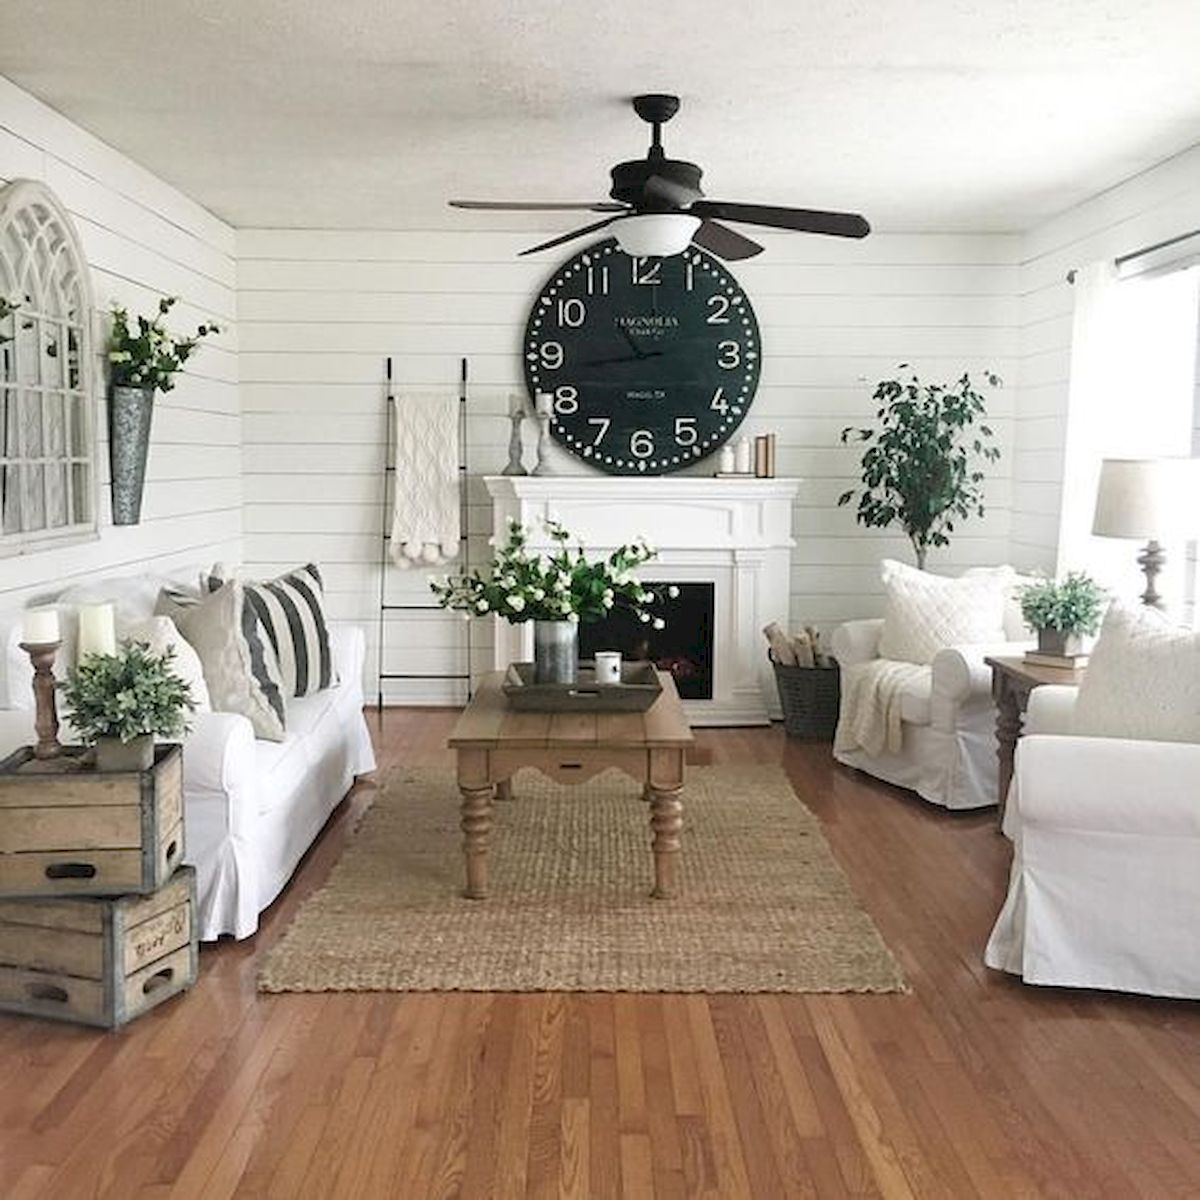 49 Elegant Small Dining Room Decorating Ideas: 30 Elegant Farmhouse Living Room Decor Ideas (15